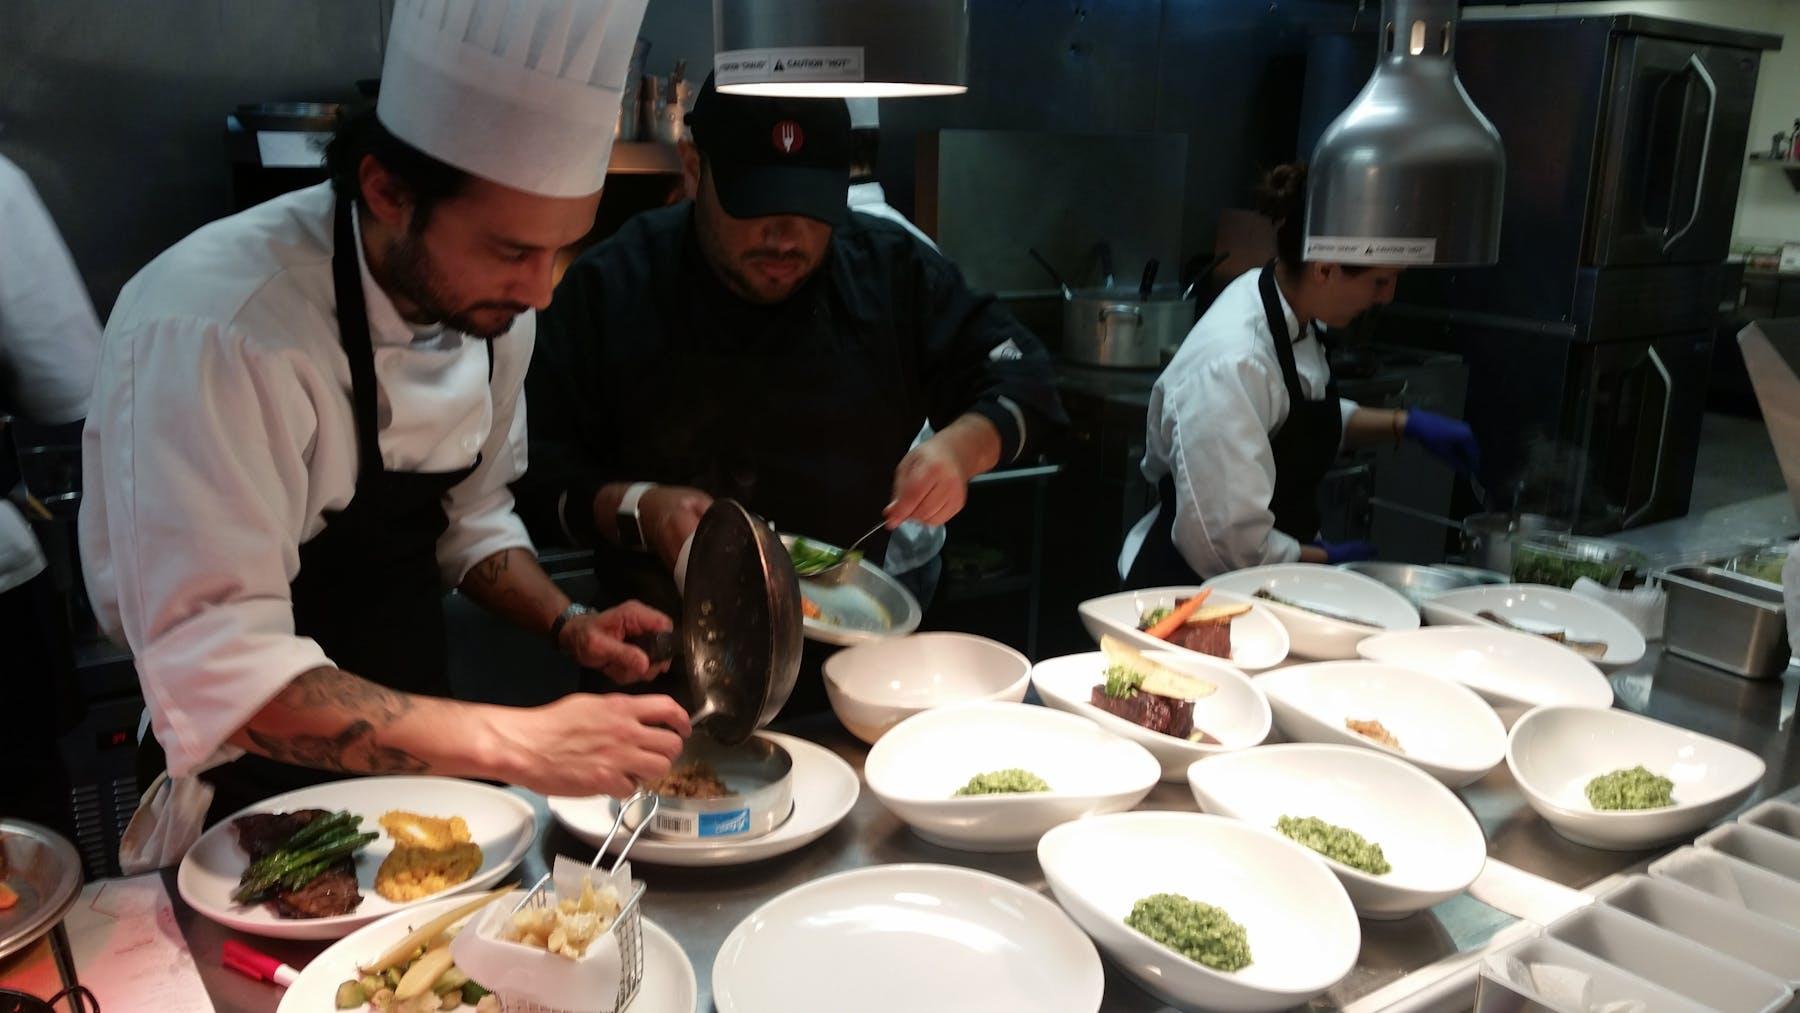 chef preps food